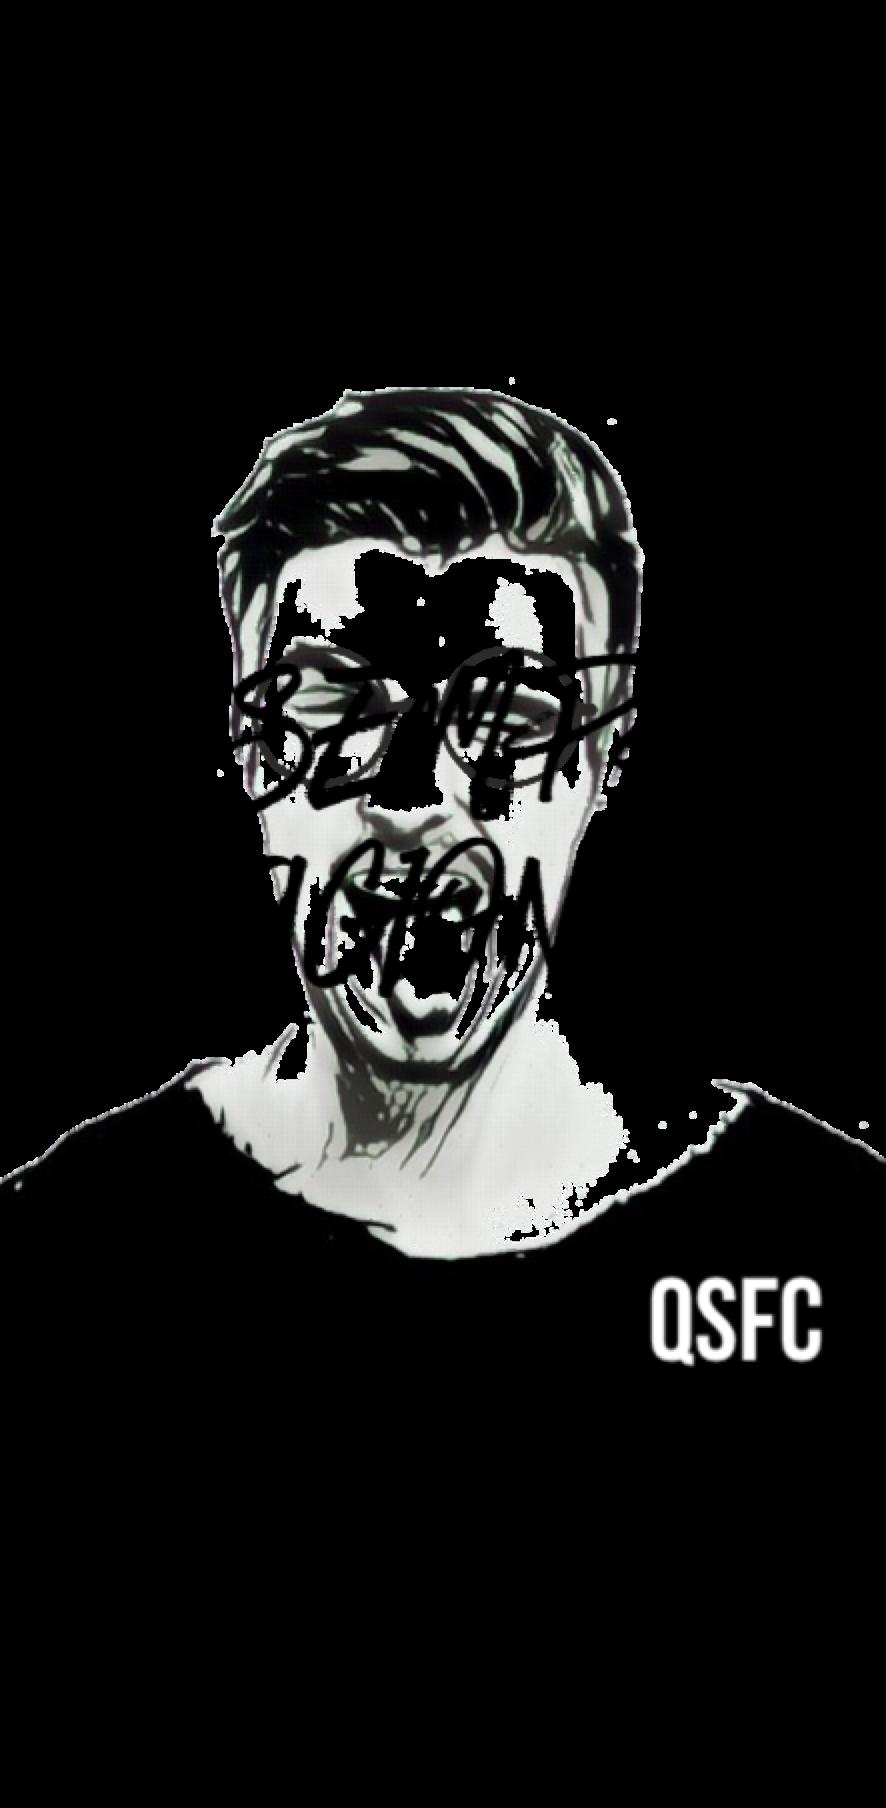 cover QSFC Ho sempre ragione